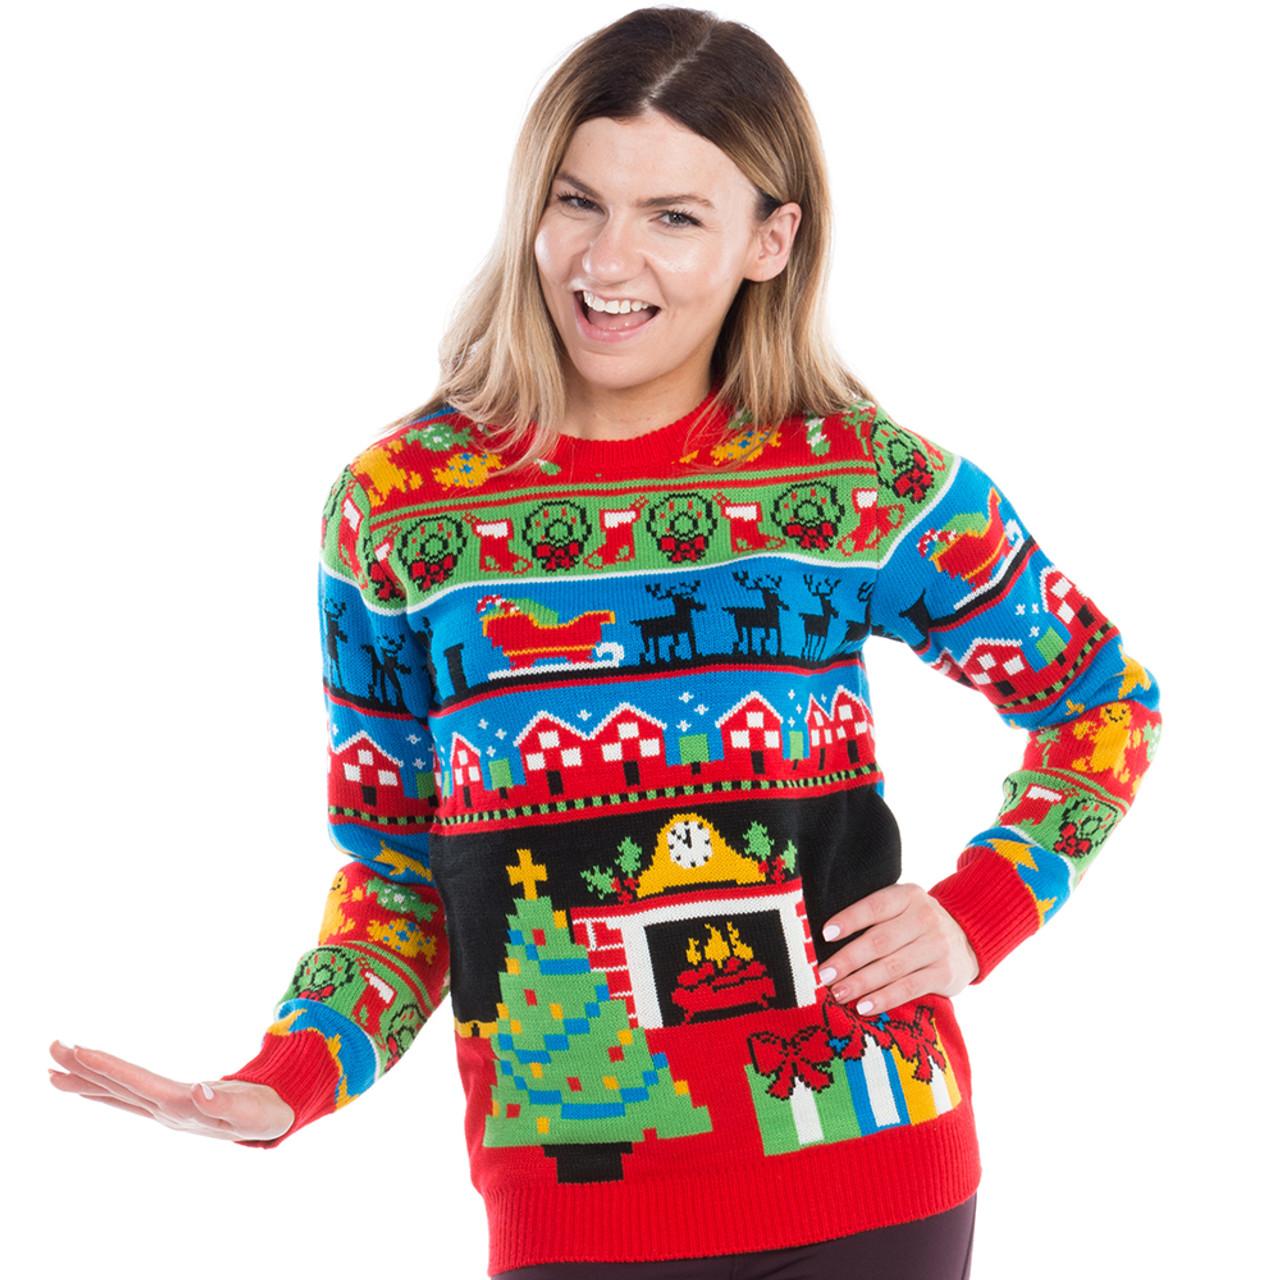 Kids Boys Girls  Mouse Jumper Xmas Sweatshirt Top Sweater Festive Novelty Gift